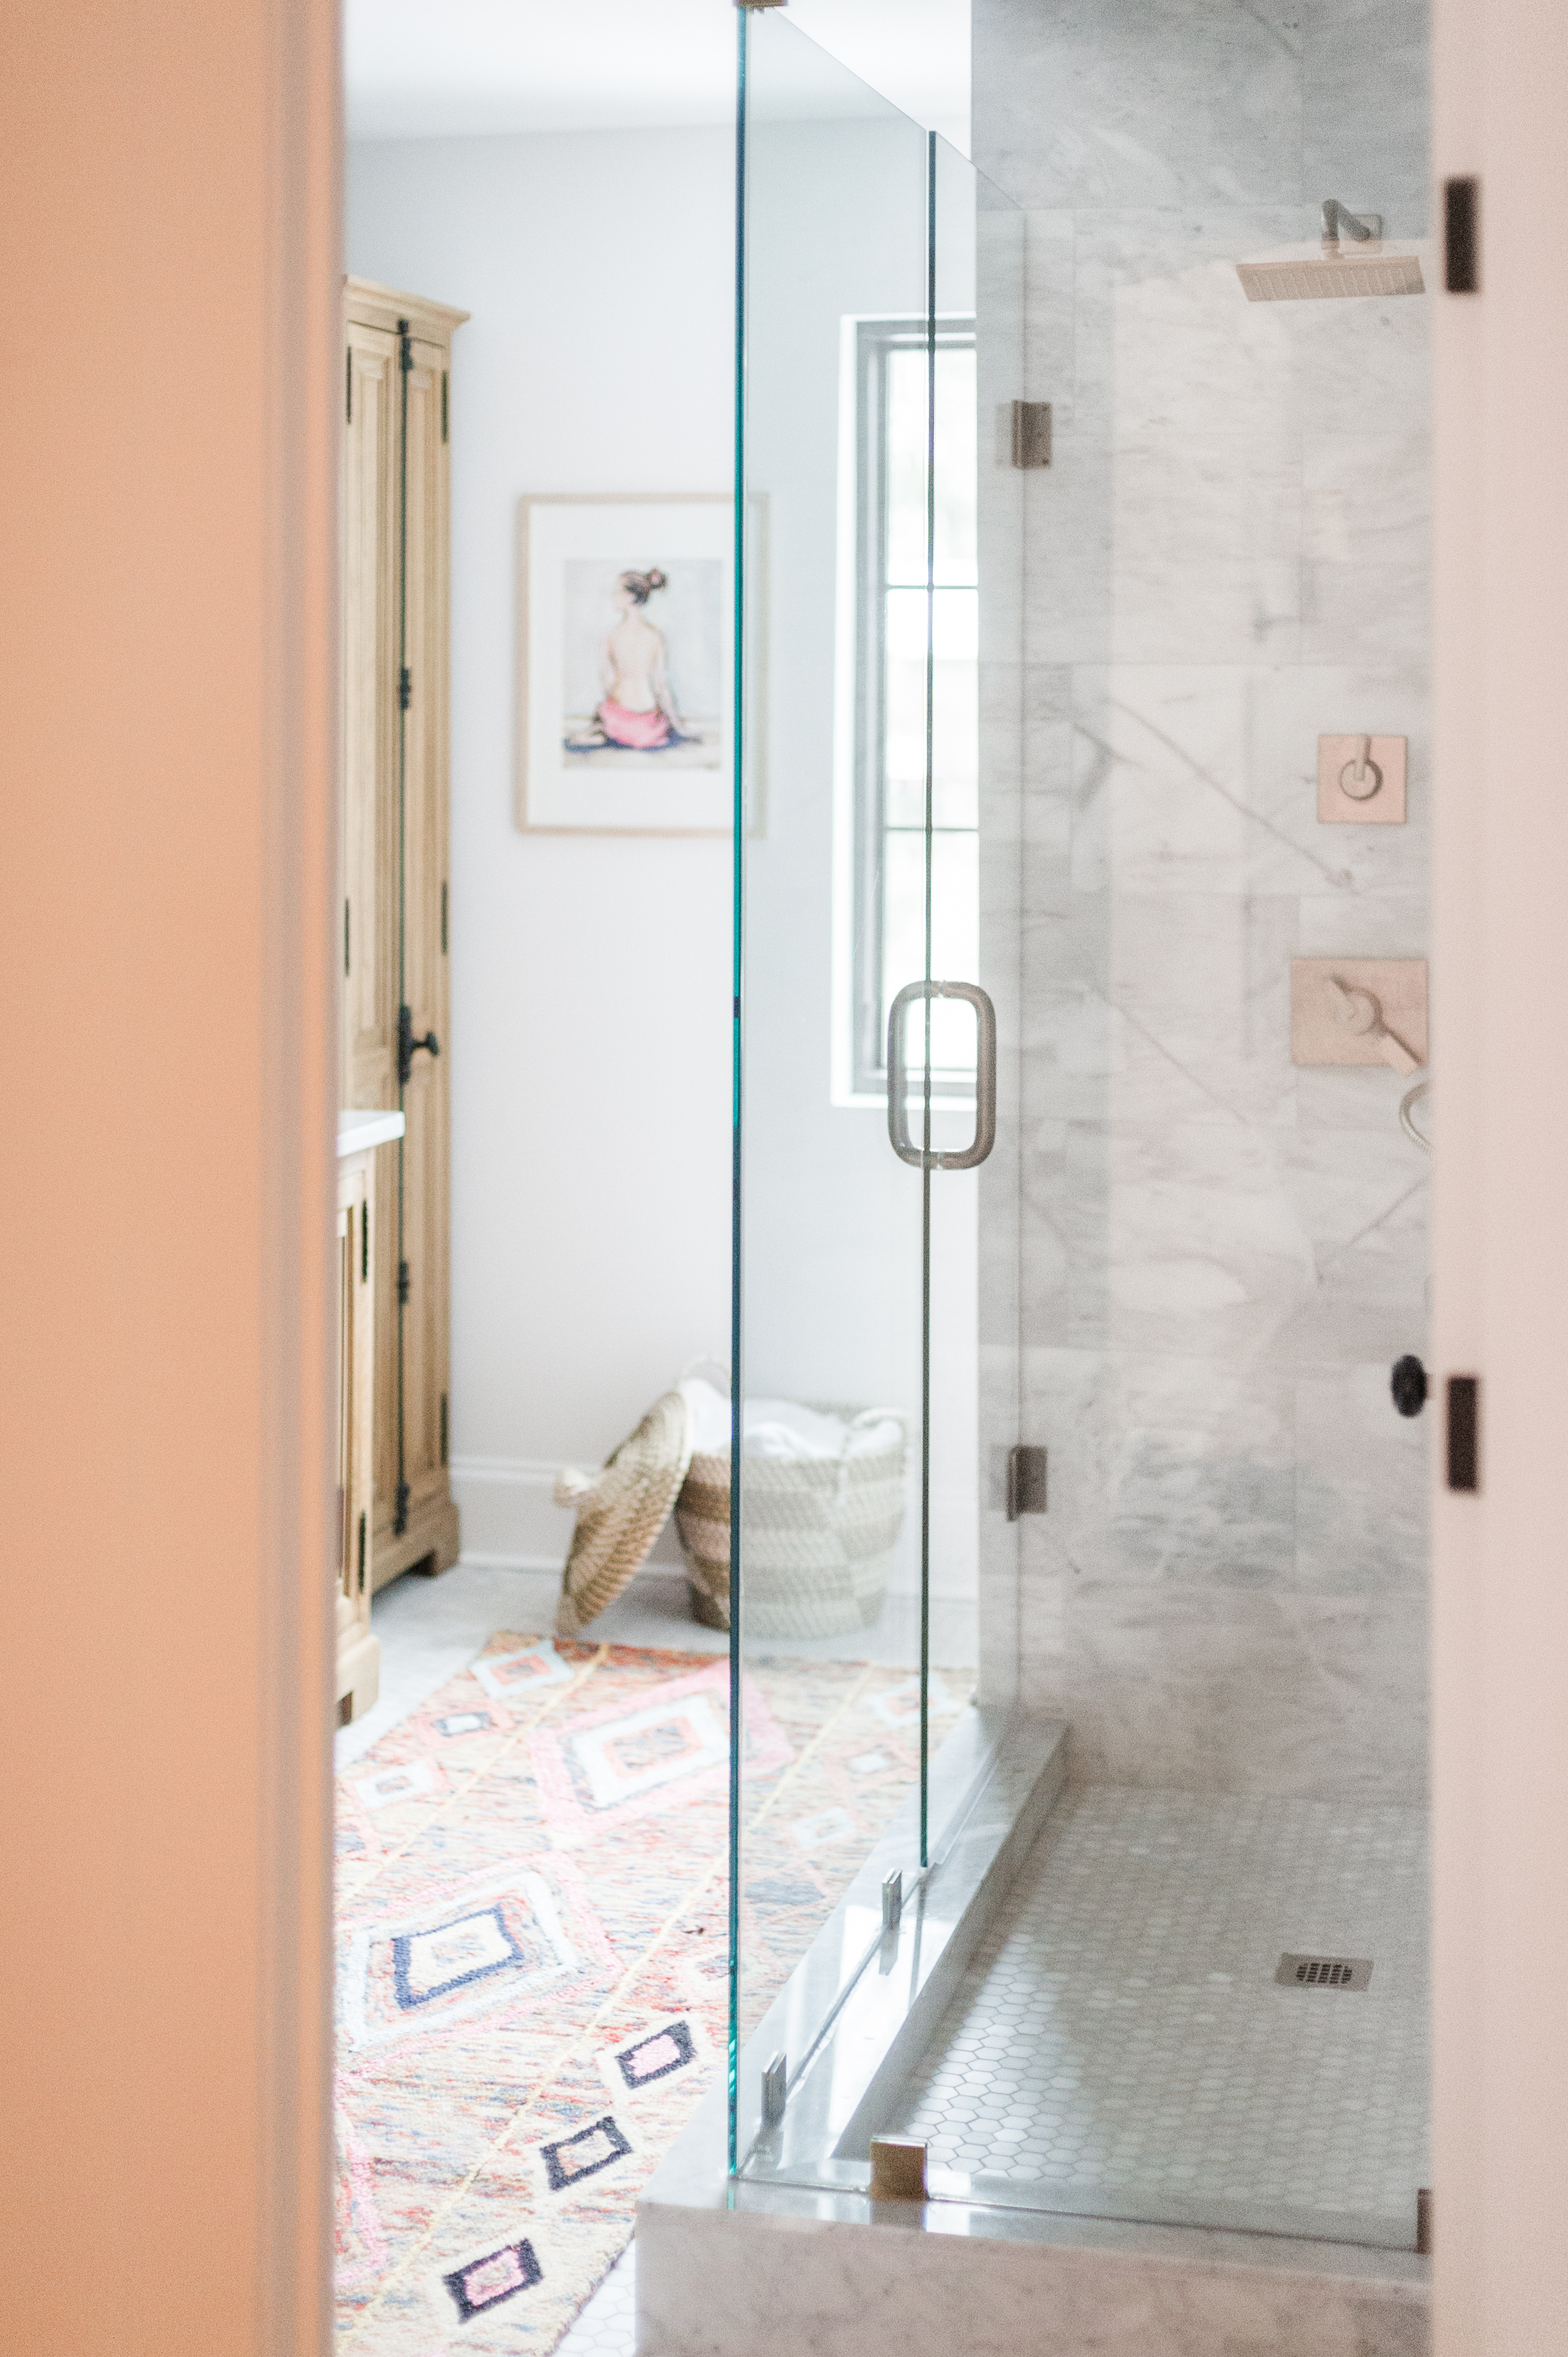 Modern Boho Bathroom Renovation Reveal - The Leslie Style